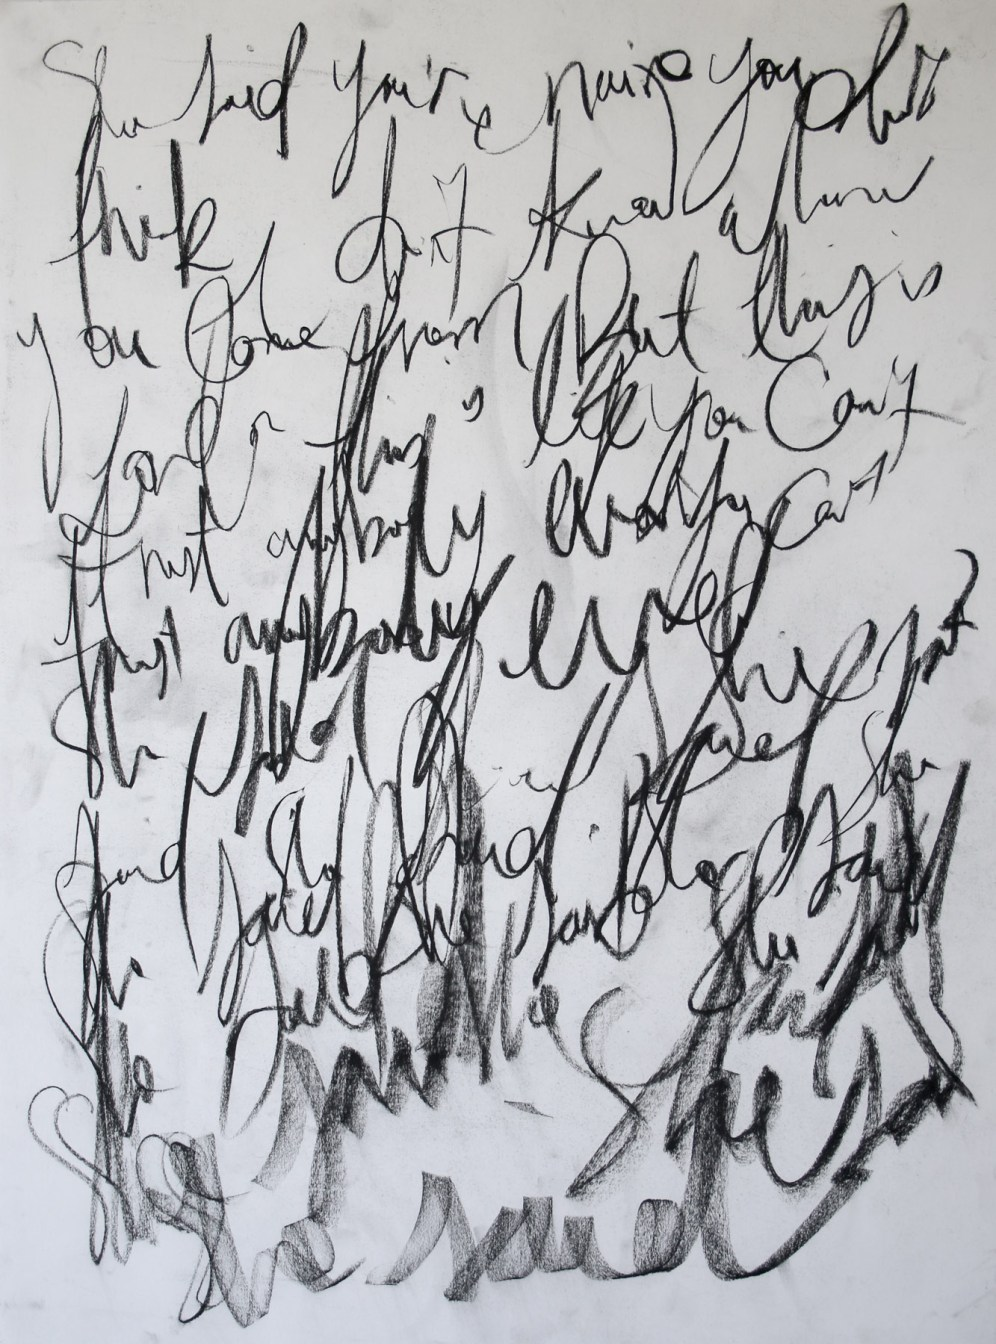 She Said, 2014, charcoal on stonehenge paper, 76 x 56cm